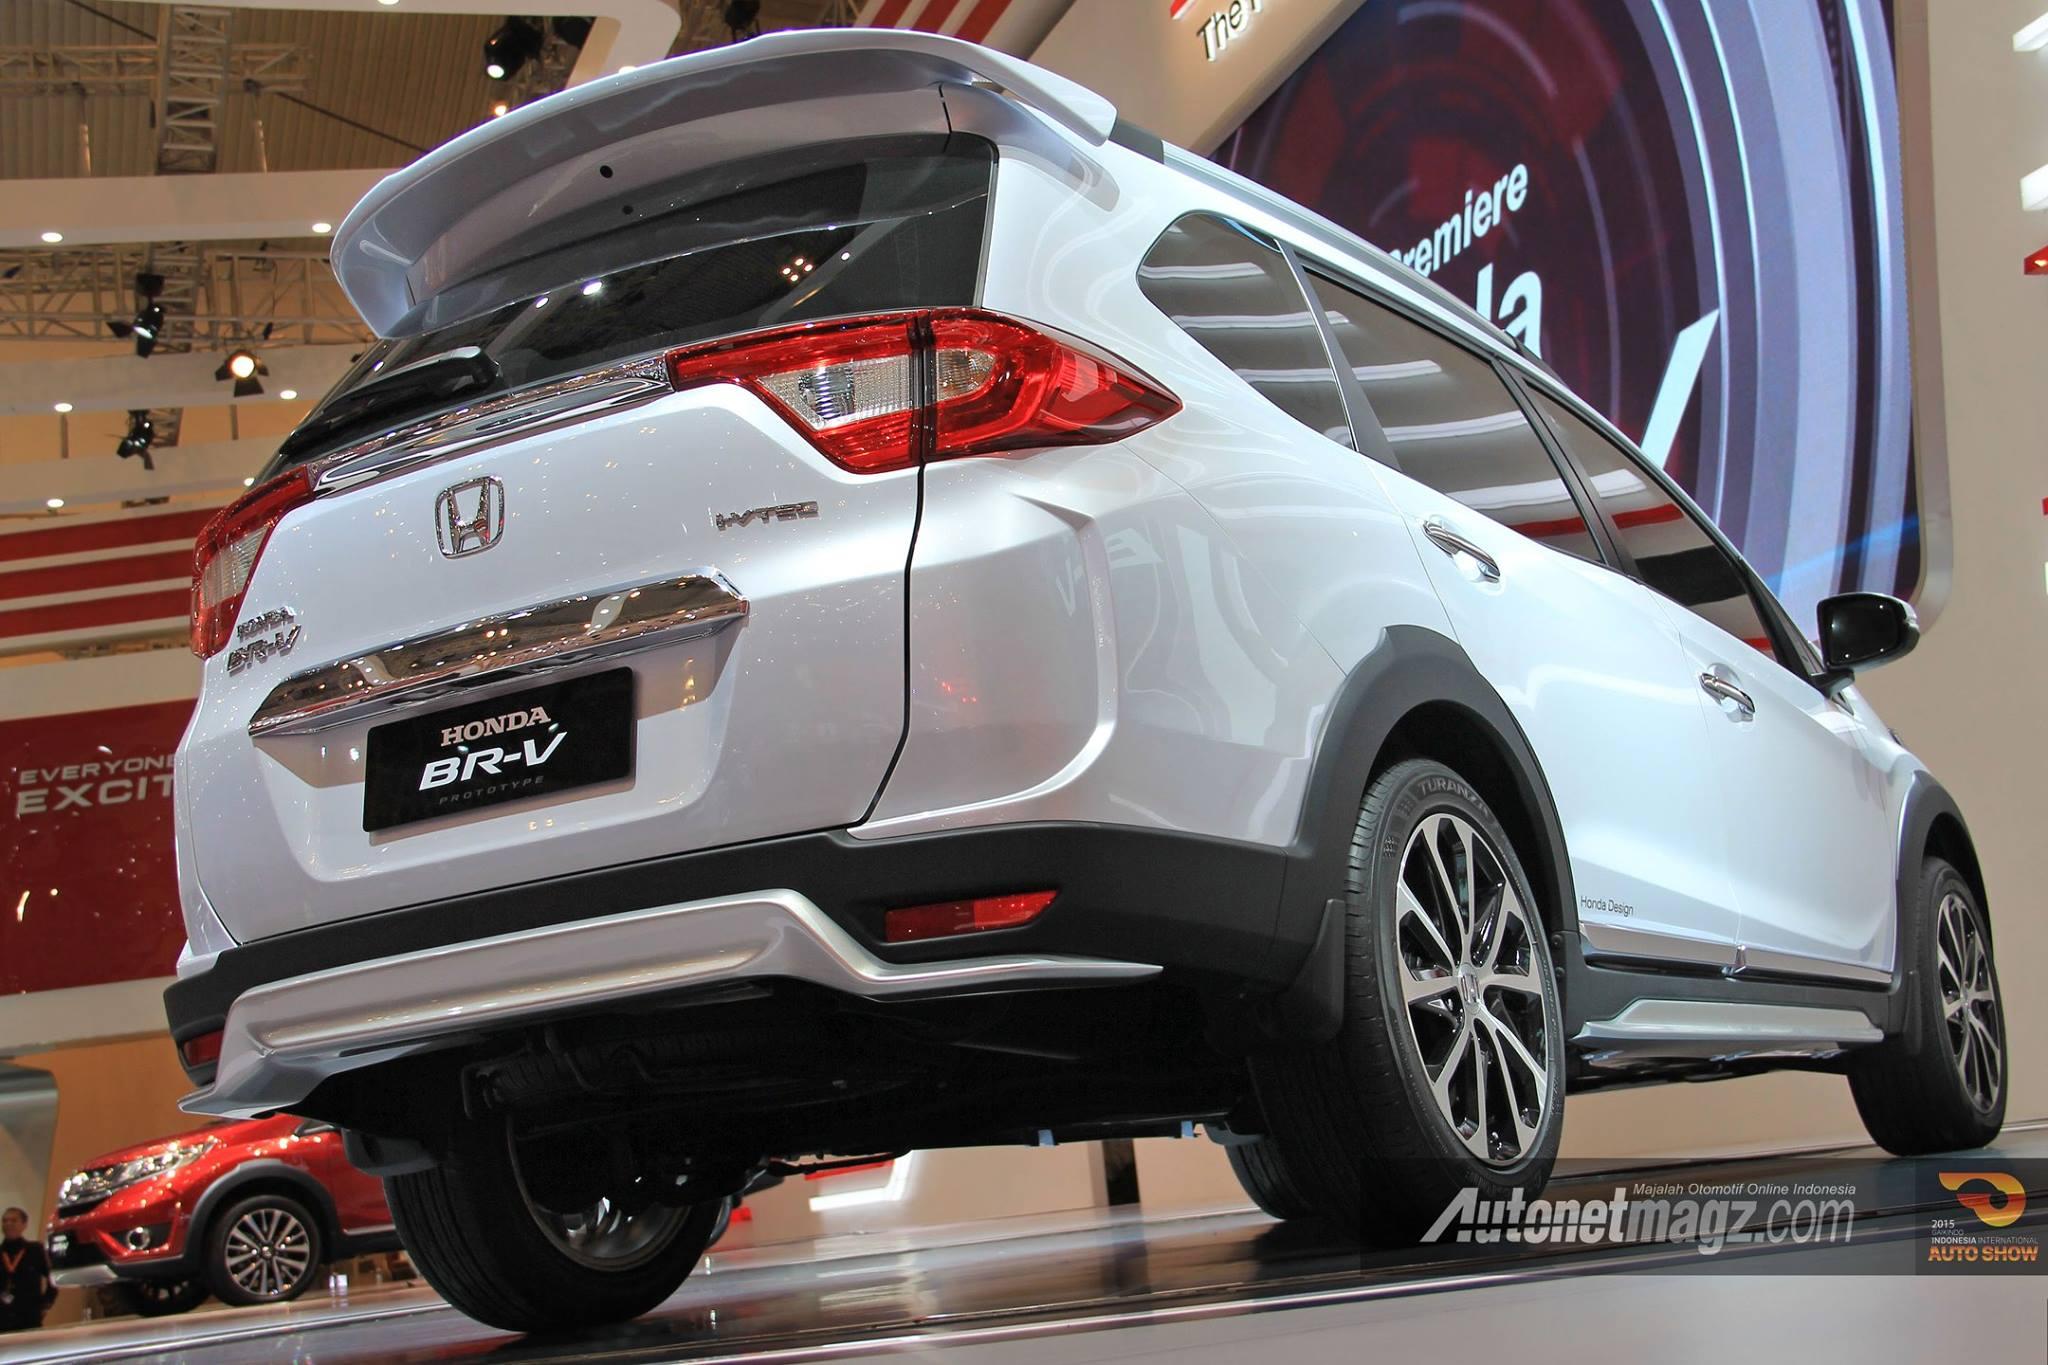 Prediksi Penjualan Honda BRV Versi Produksi  Total 4